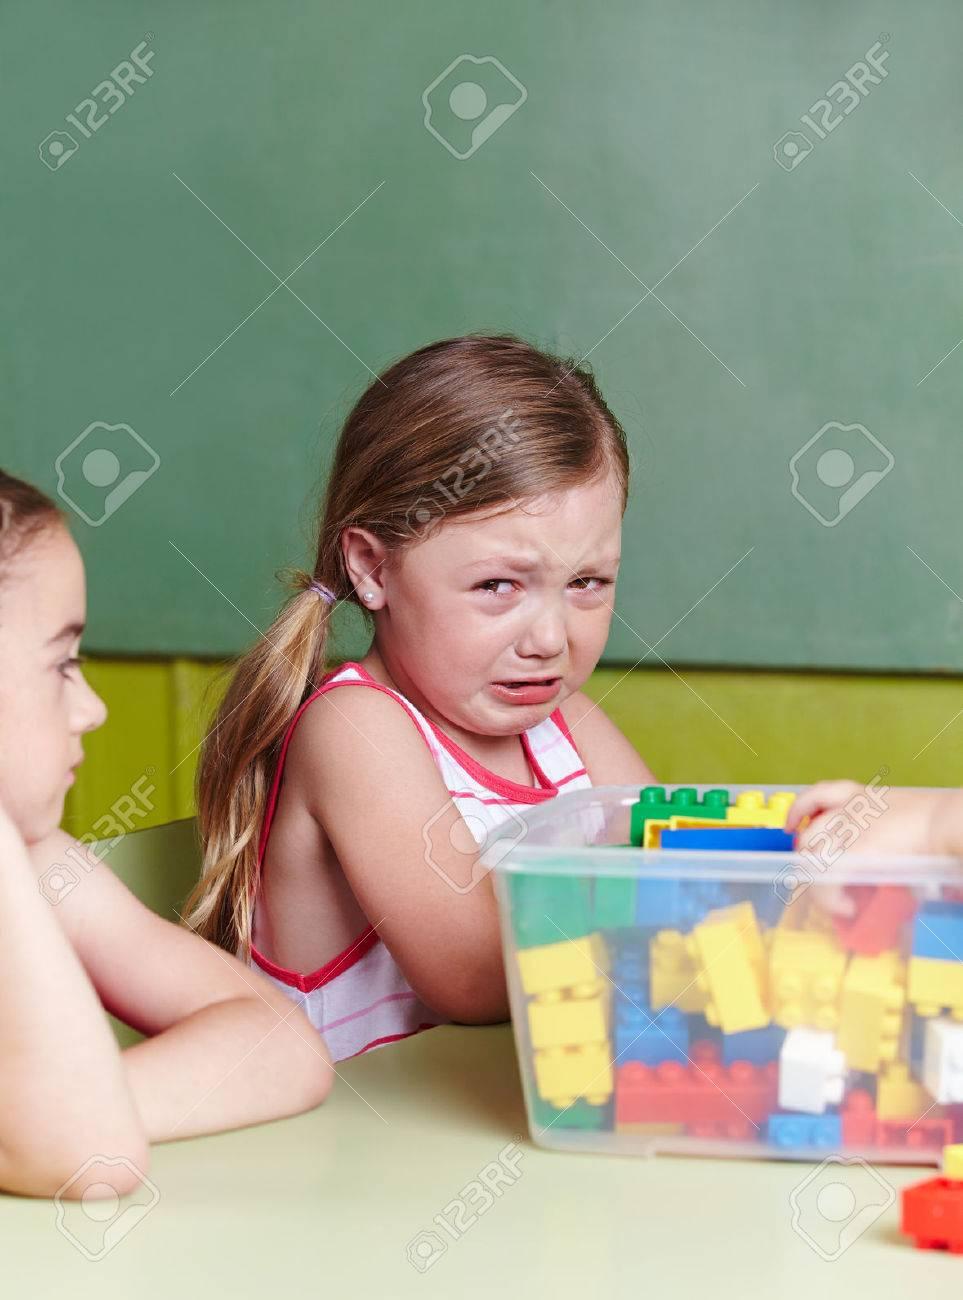 math worksheet : kindergarten bullying  worksheets for kids teachers  free  : Bullying Worksheets For Kindergarten